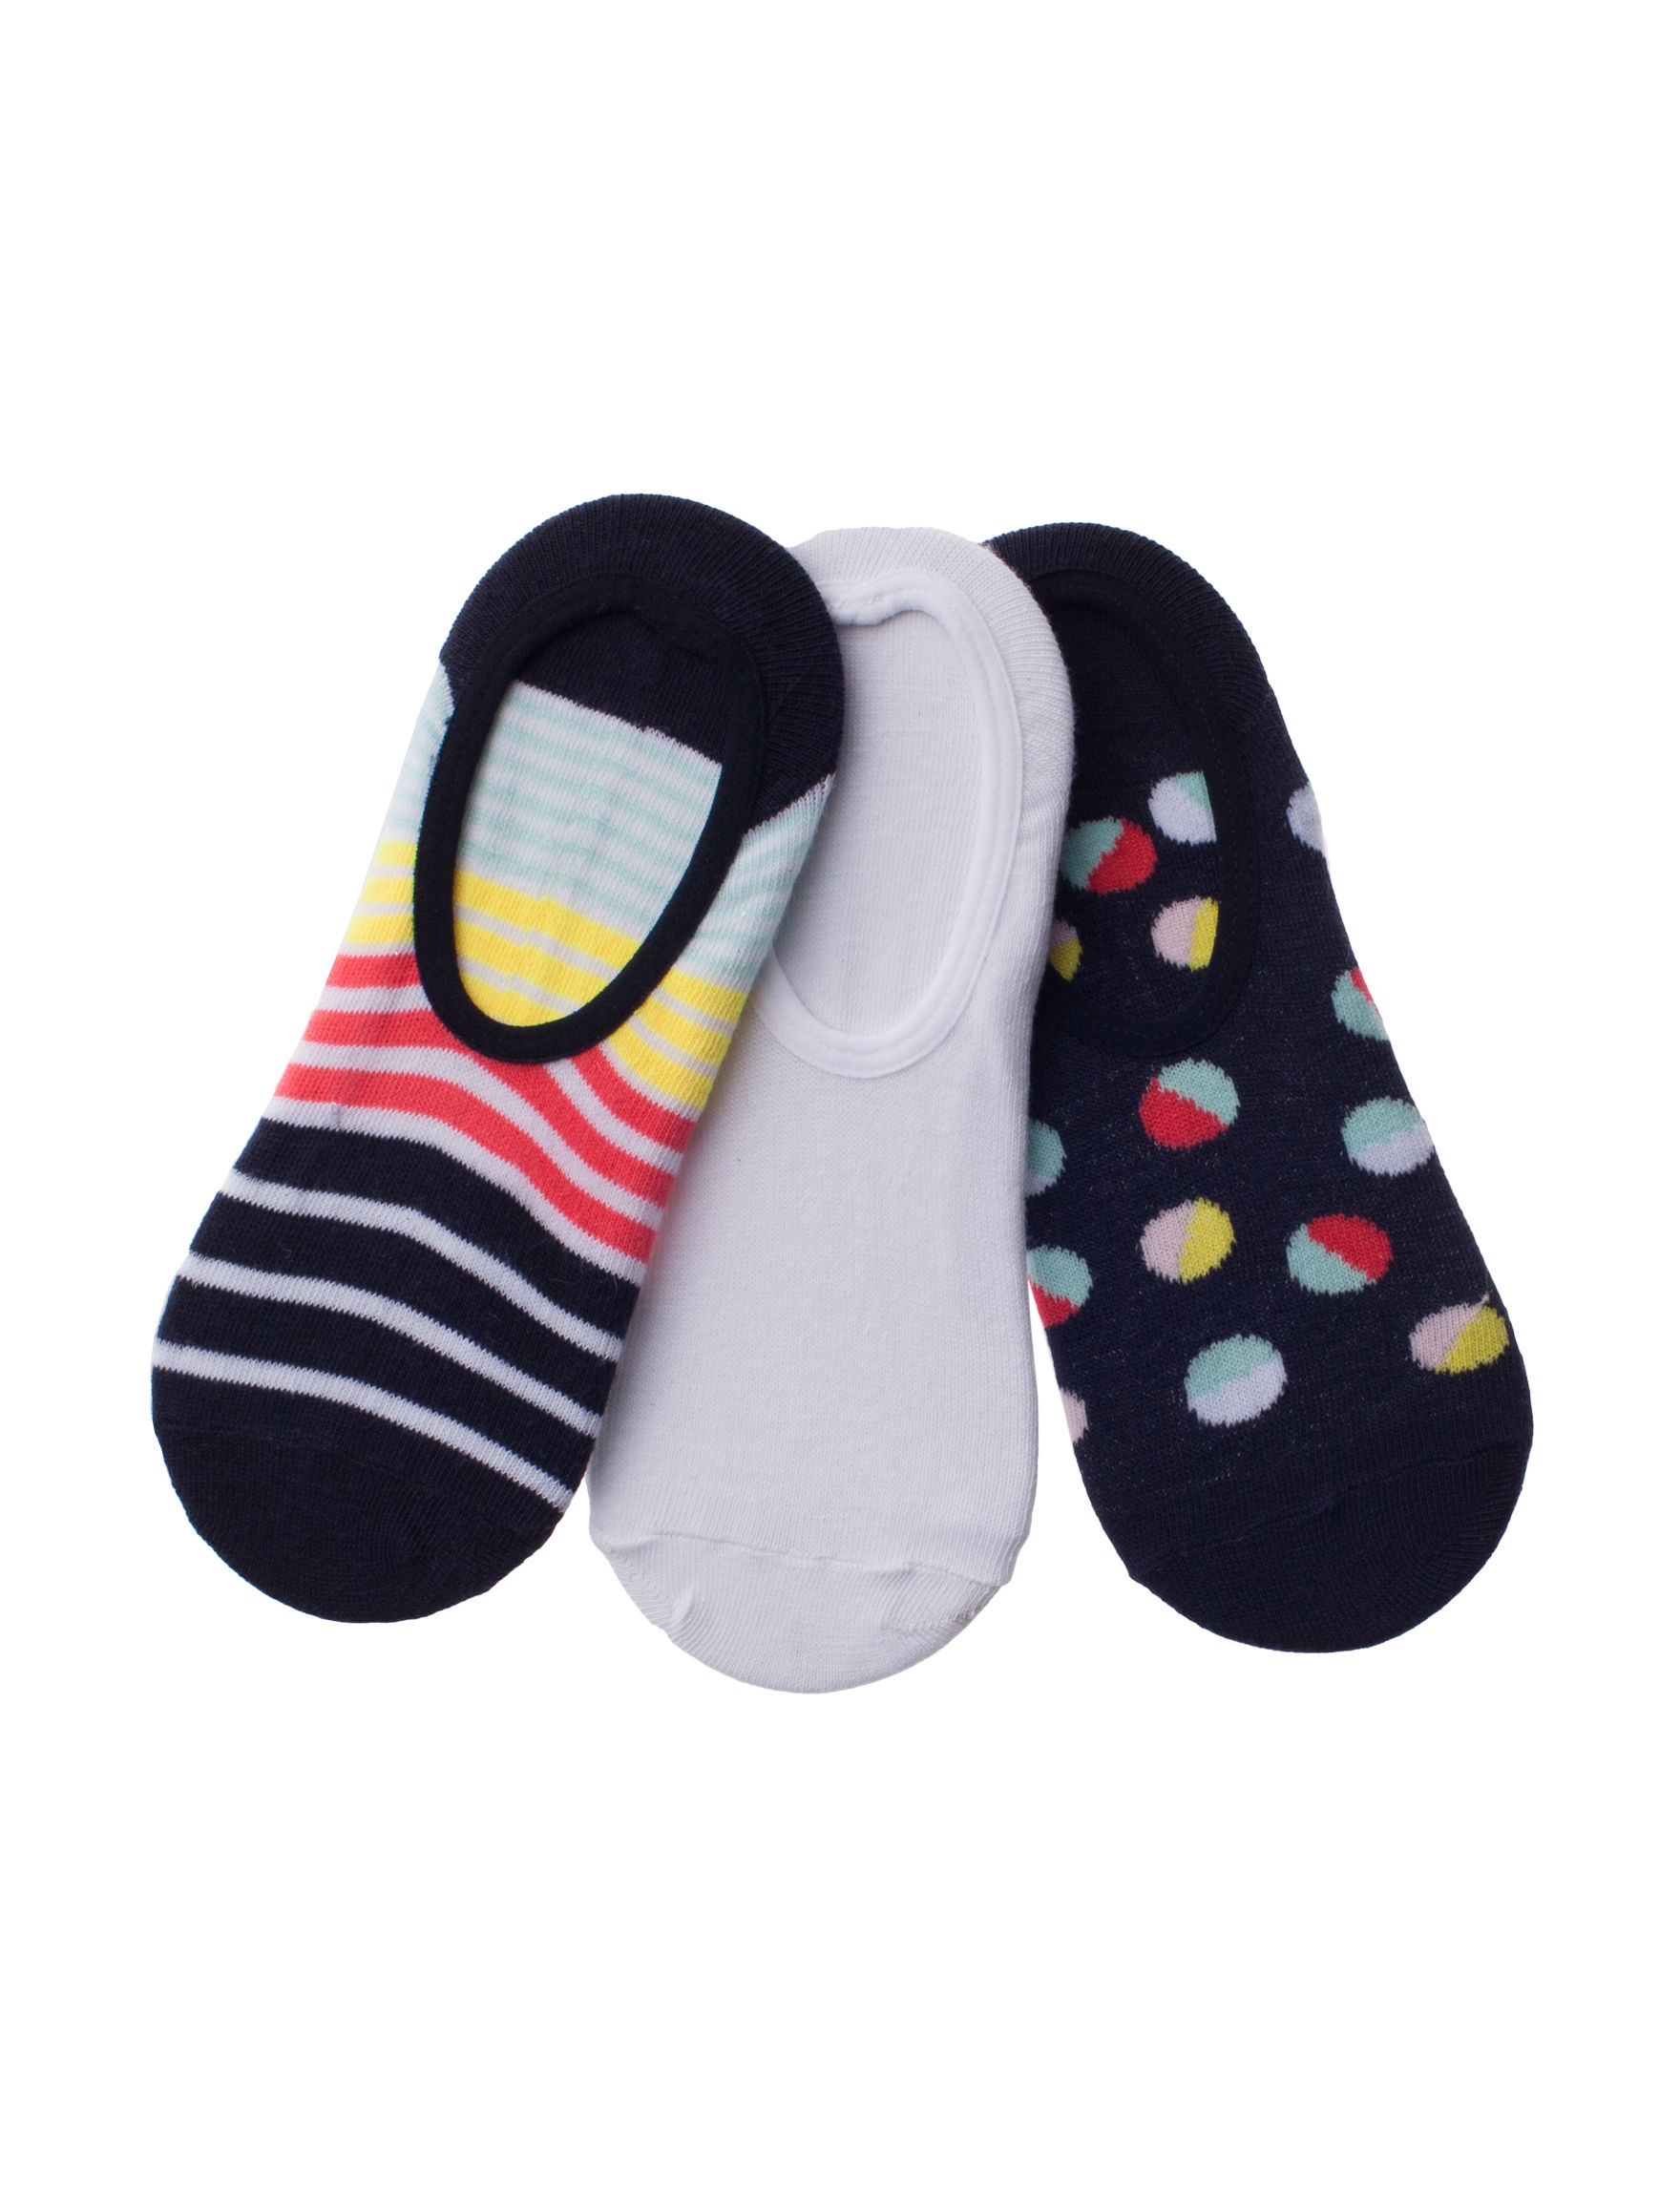 Capelli Navy Multi Socks